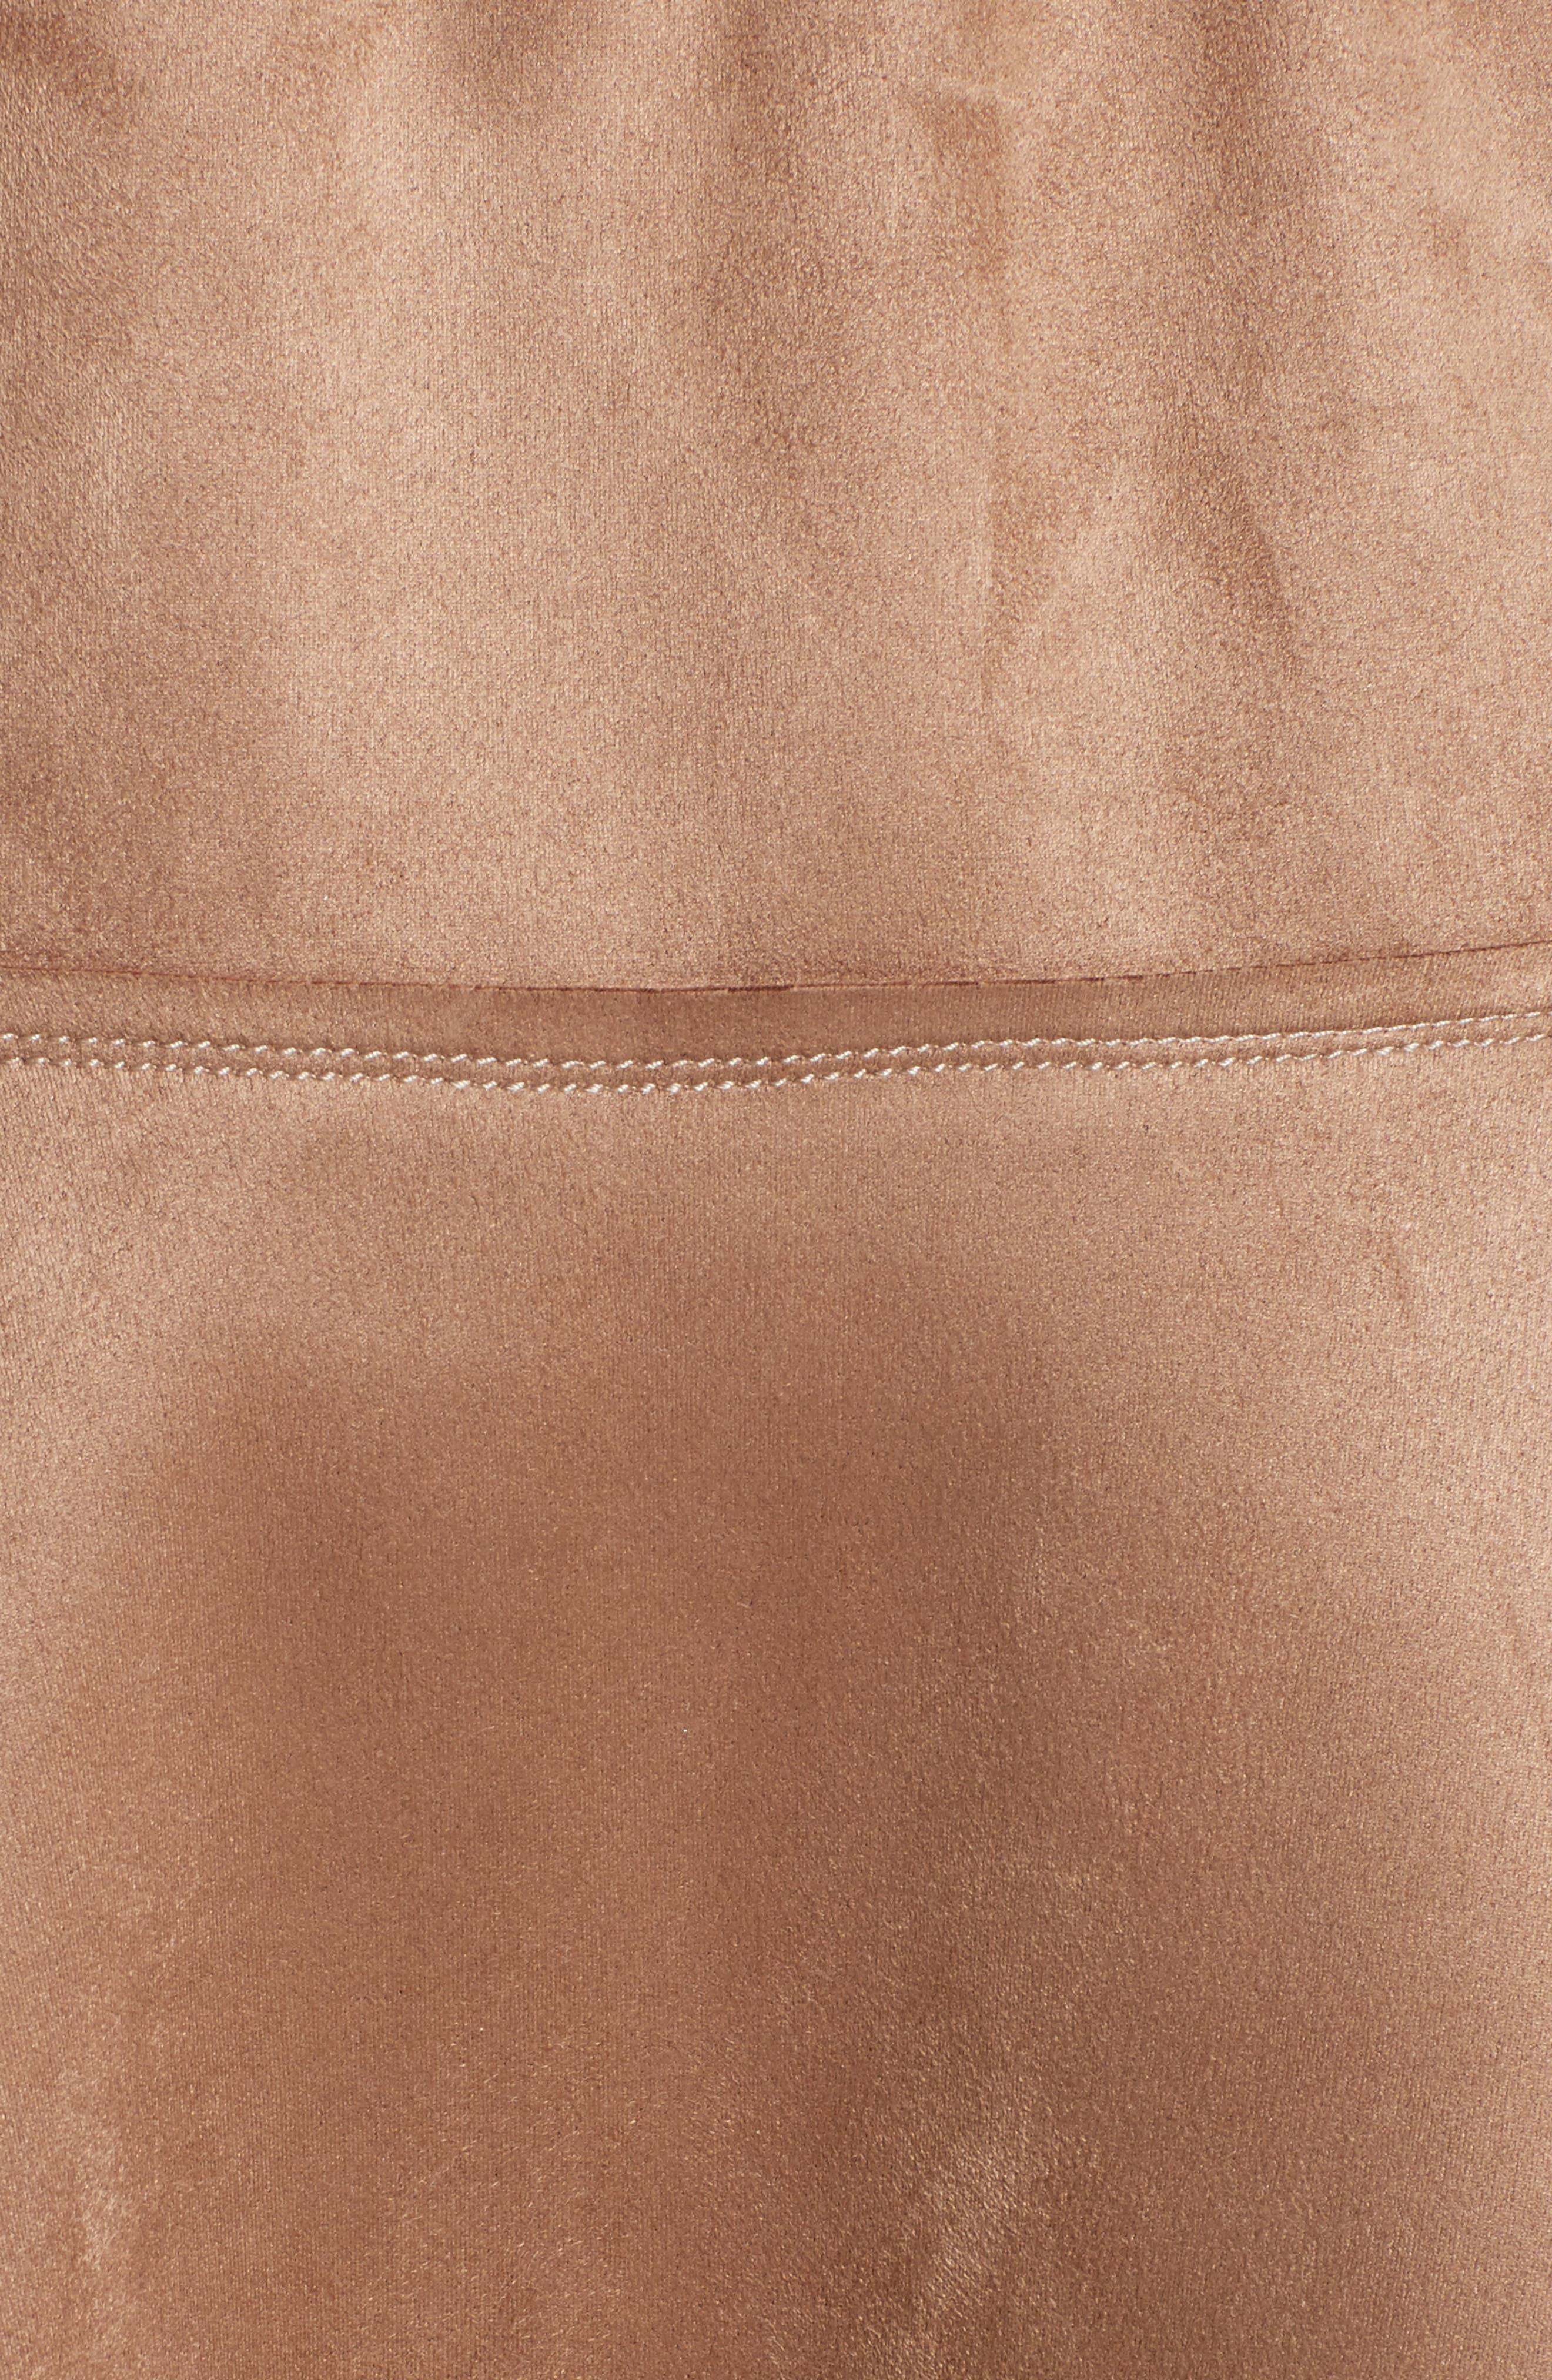 Metallic Midi Skirt,                             Alternate thumbnail 5, color,